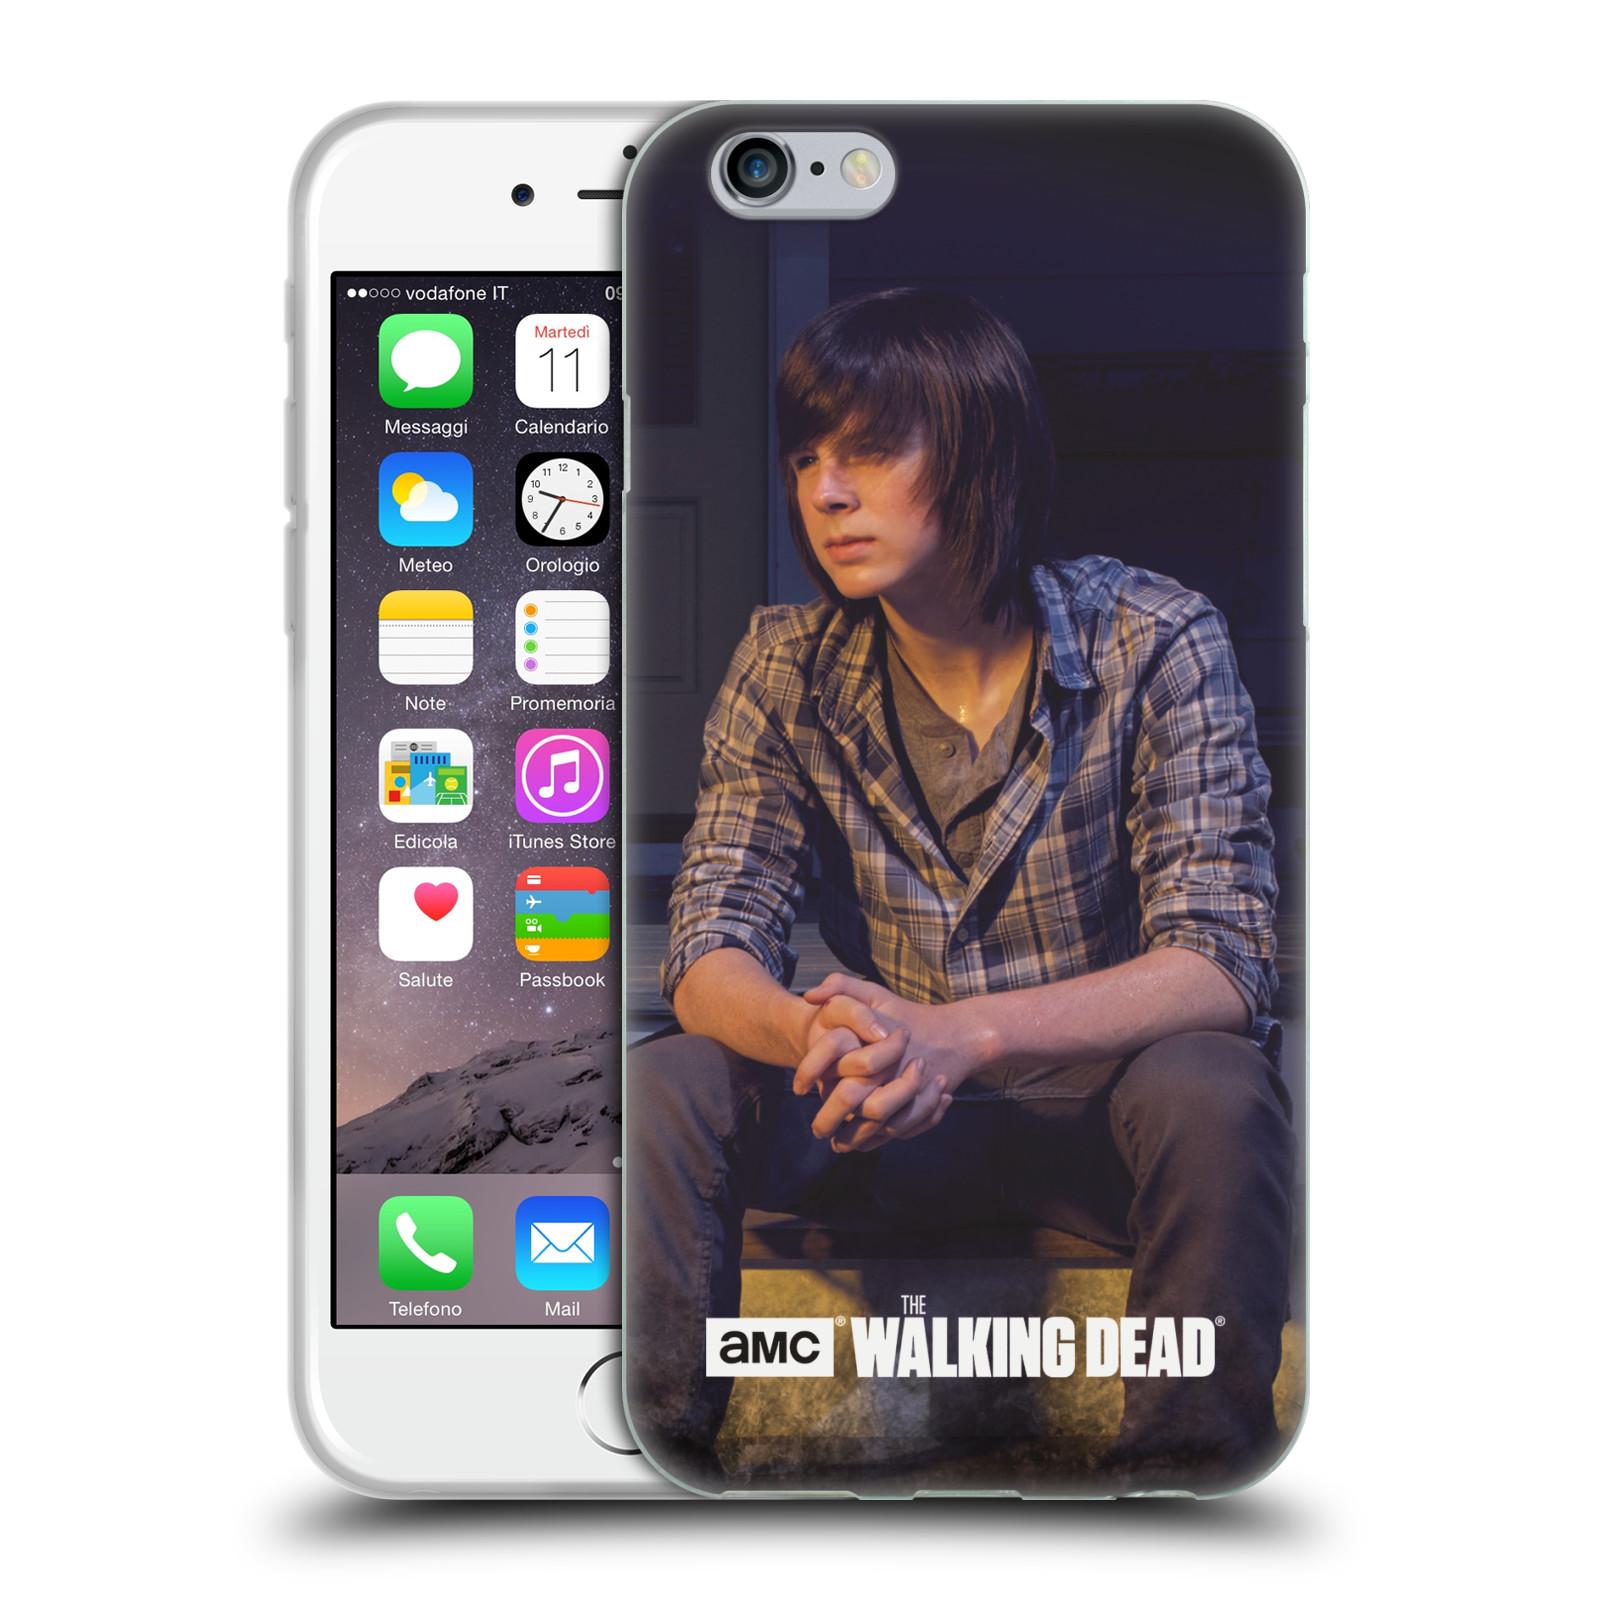 HEAD CASE silikonový obal na mobil Apple Iphone 6 / 6S originální potisk Walking Dead postavy v akci Carl